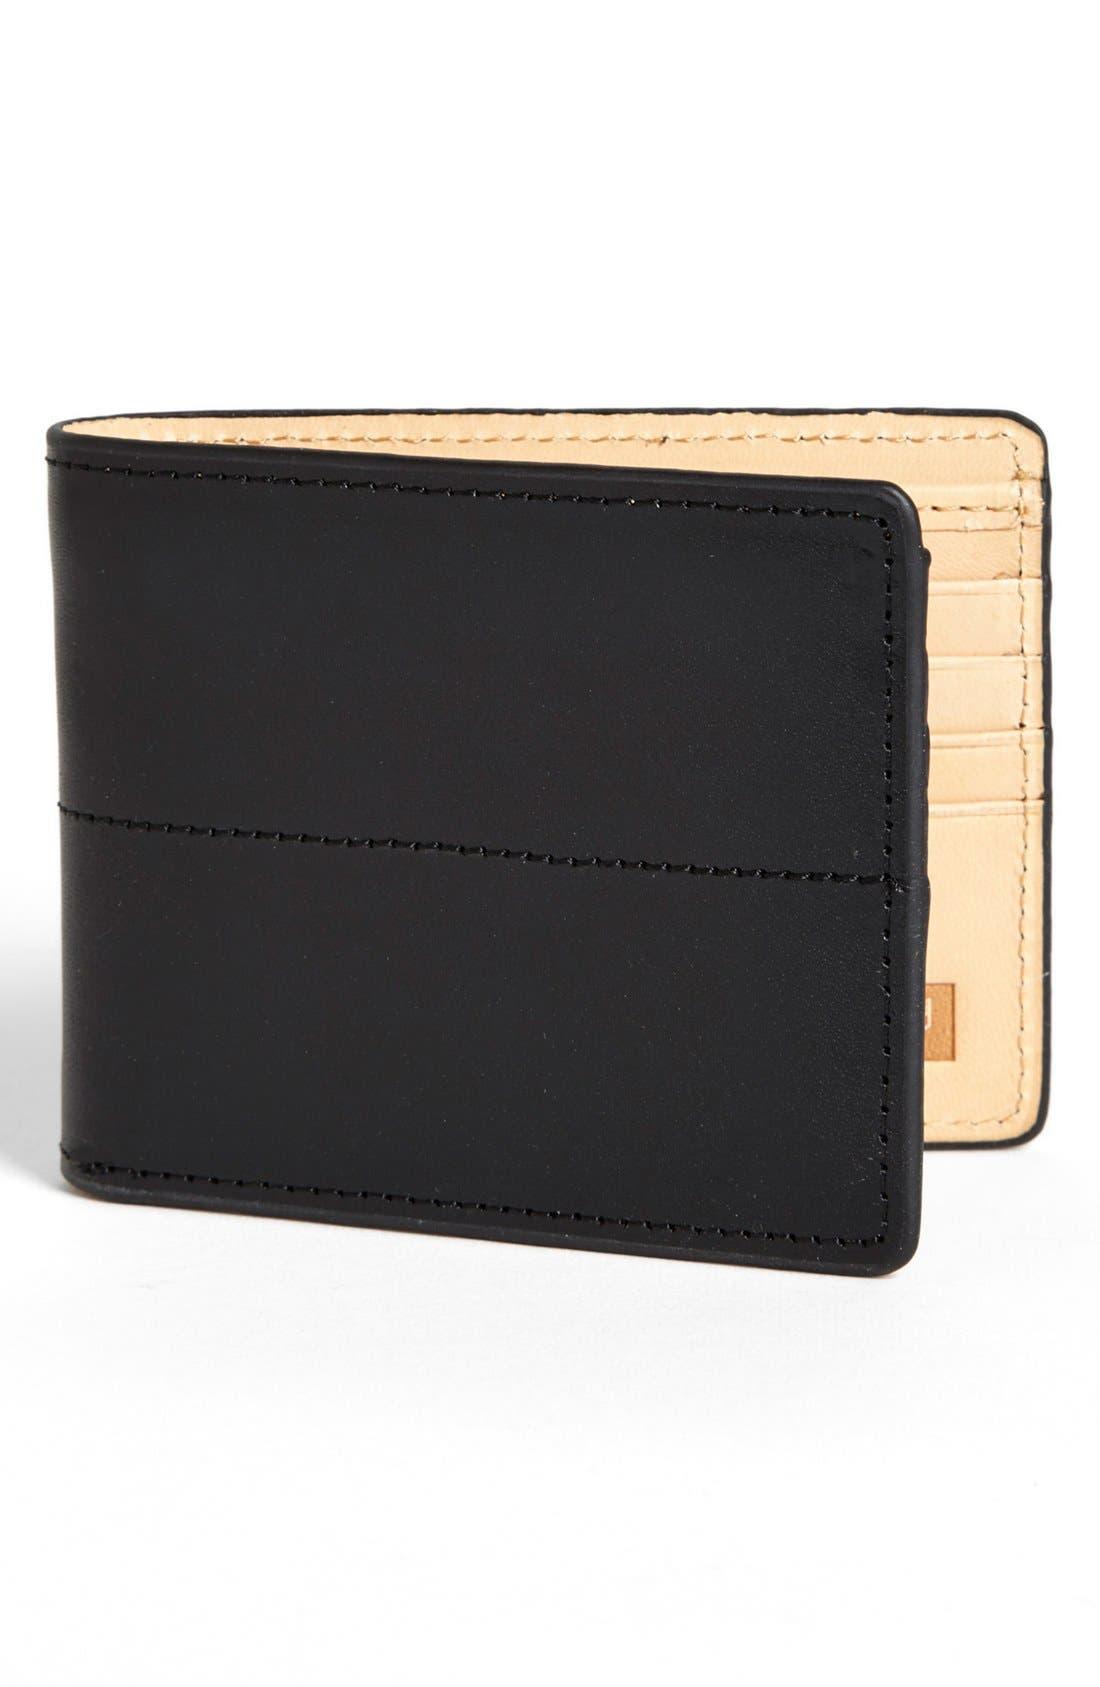 Alternate Image 1 Selected - J Fold 'Thunderbird' Slimfold Wallet